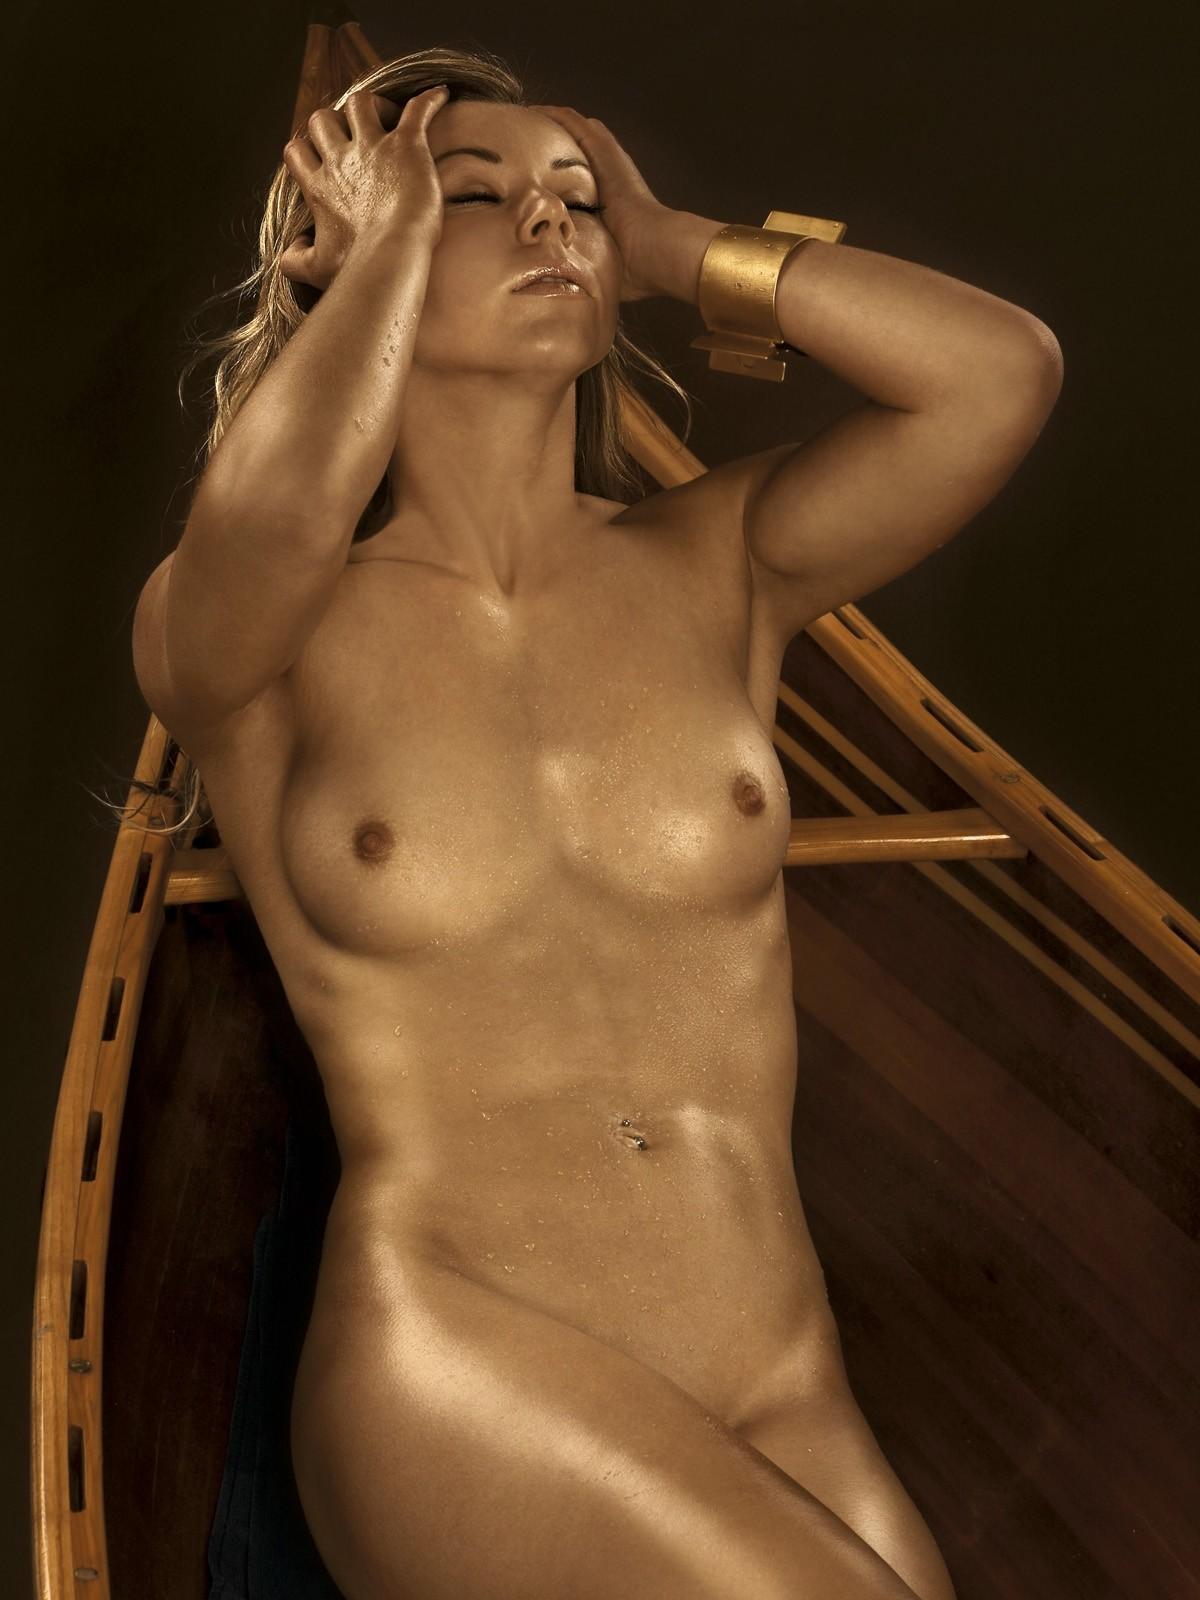 Nicole-Reinhardt-German-Olympians-Nude-For-Playboy-3.jpg